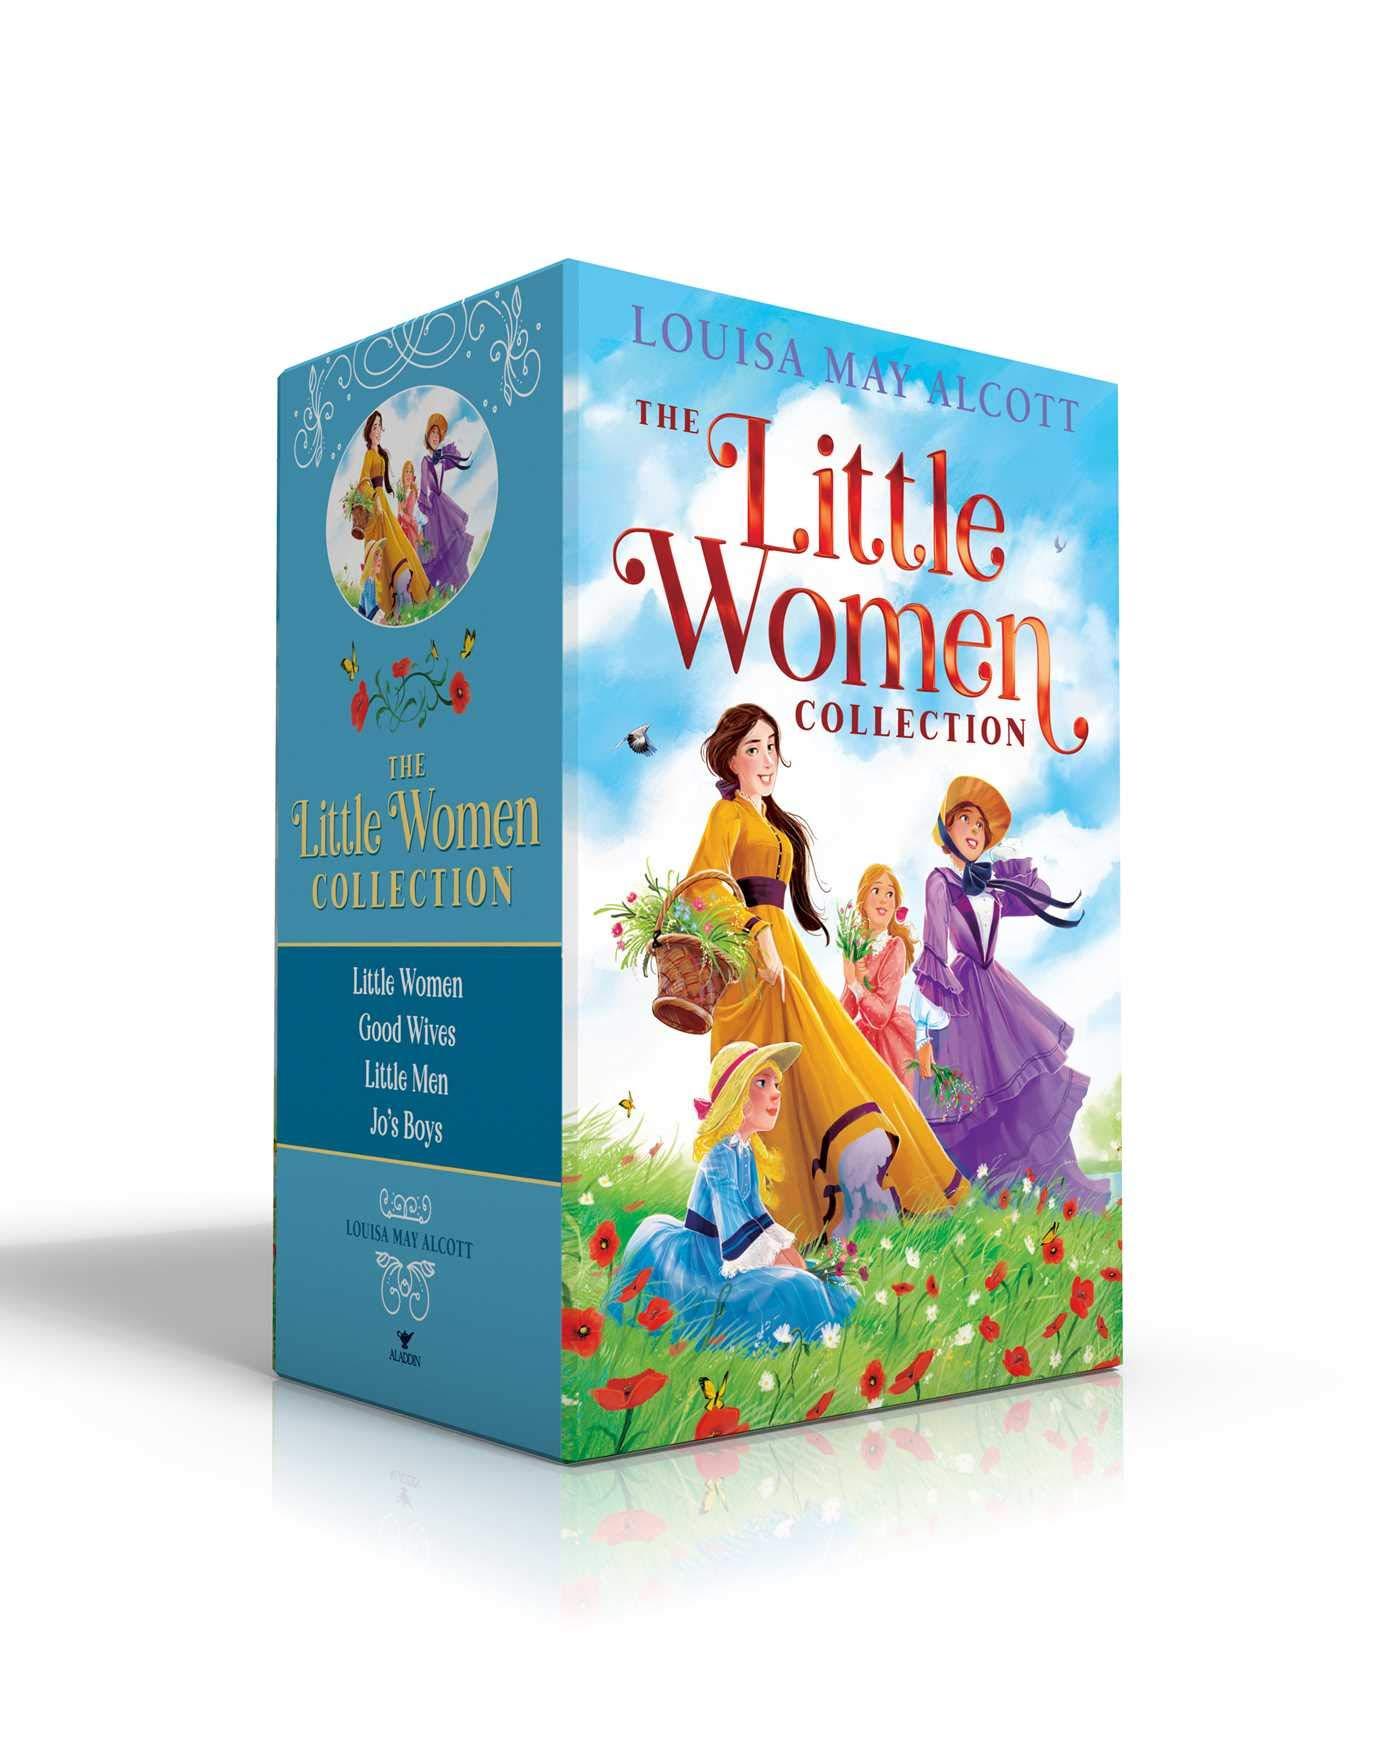 The Little Women Collection: Little Women; Good Wives; Little Men; Jos Boys